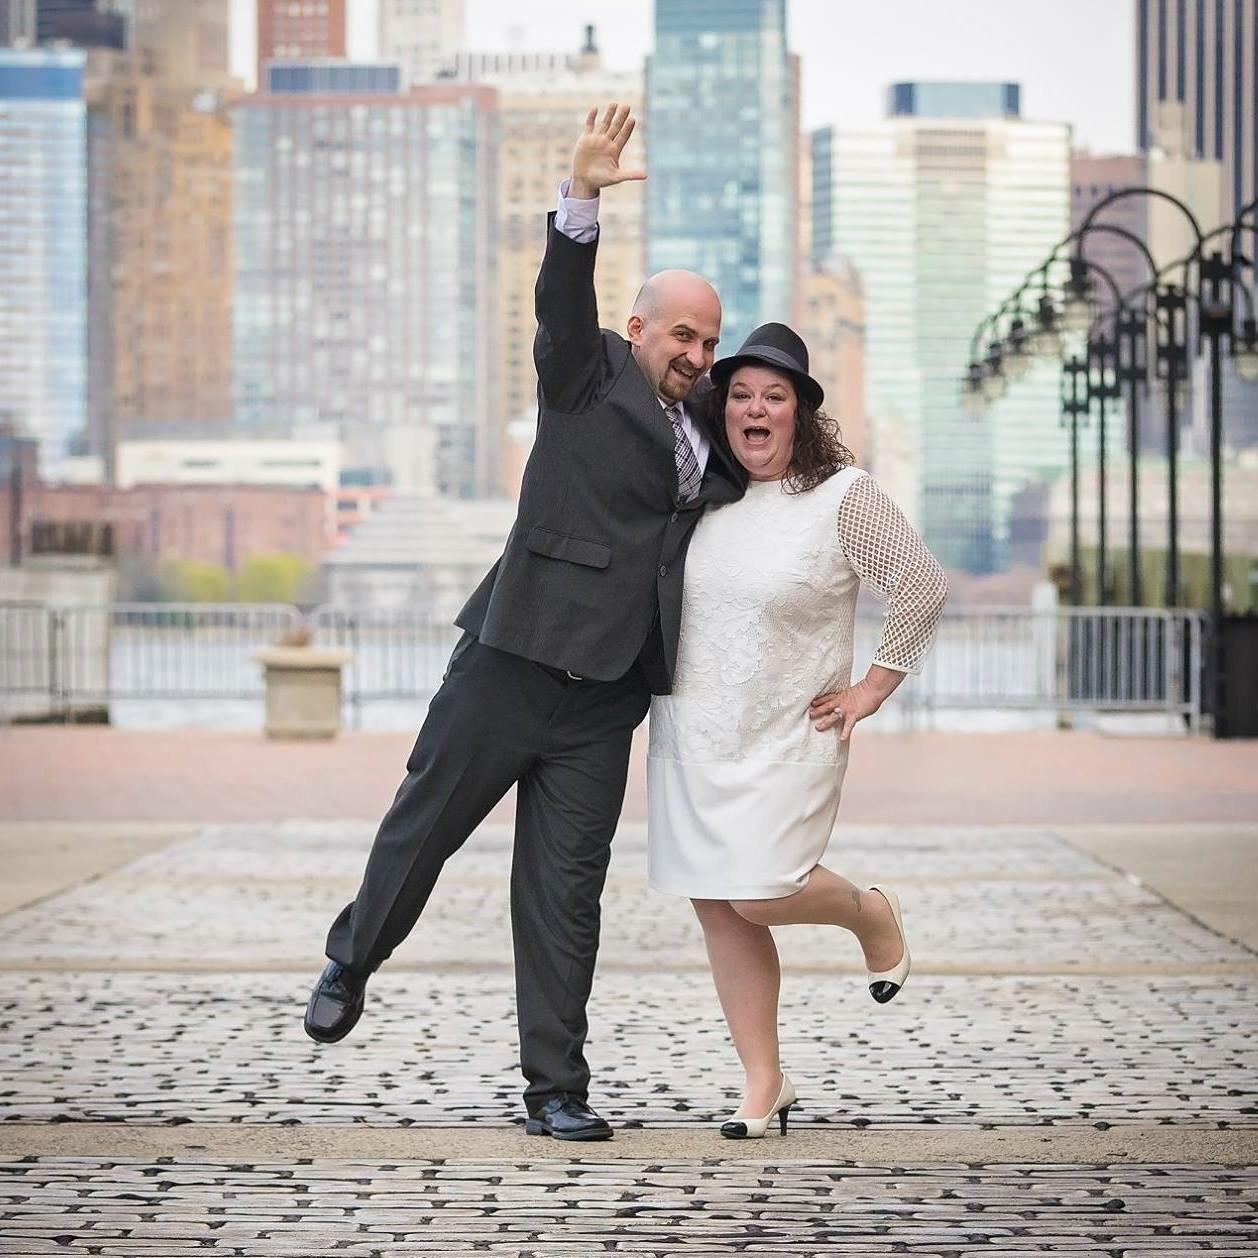 Wedding. Cancer. Divorce.